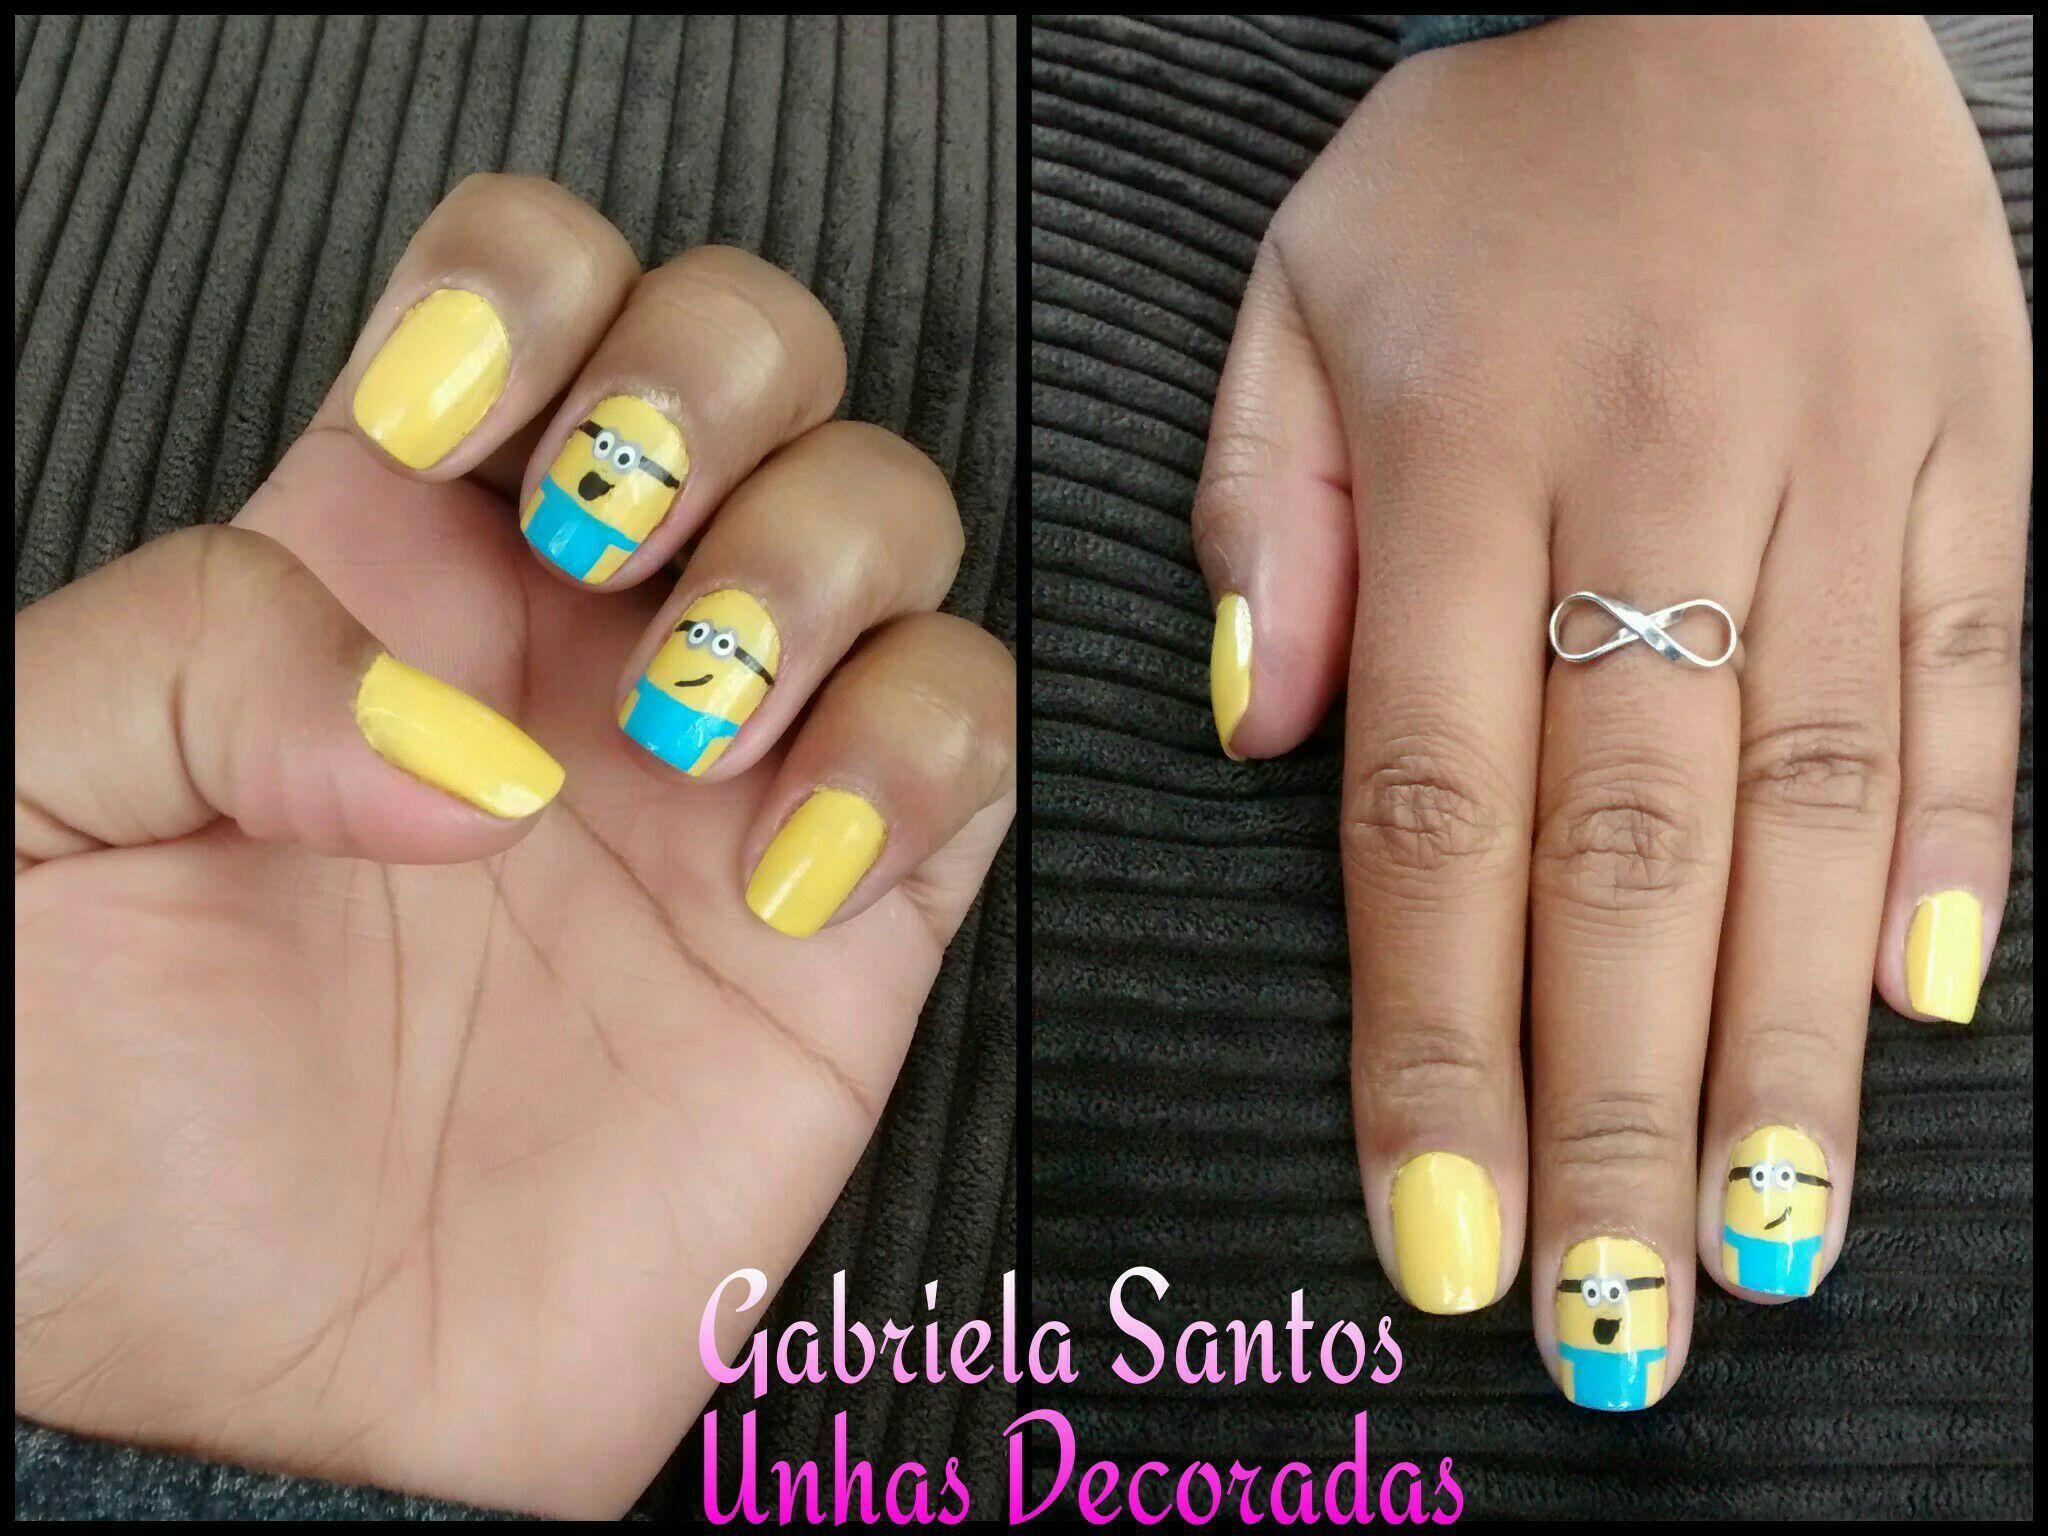 #UnhasDecoradas minions #NailArt  #DecoradaaMão #Esmalte manicure e pedicure